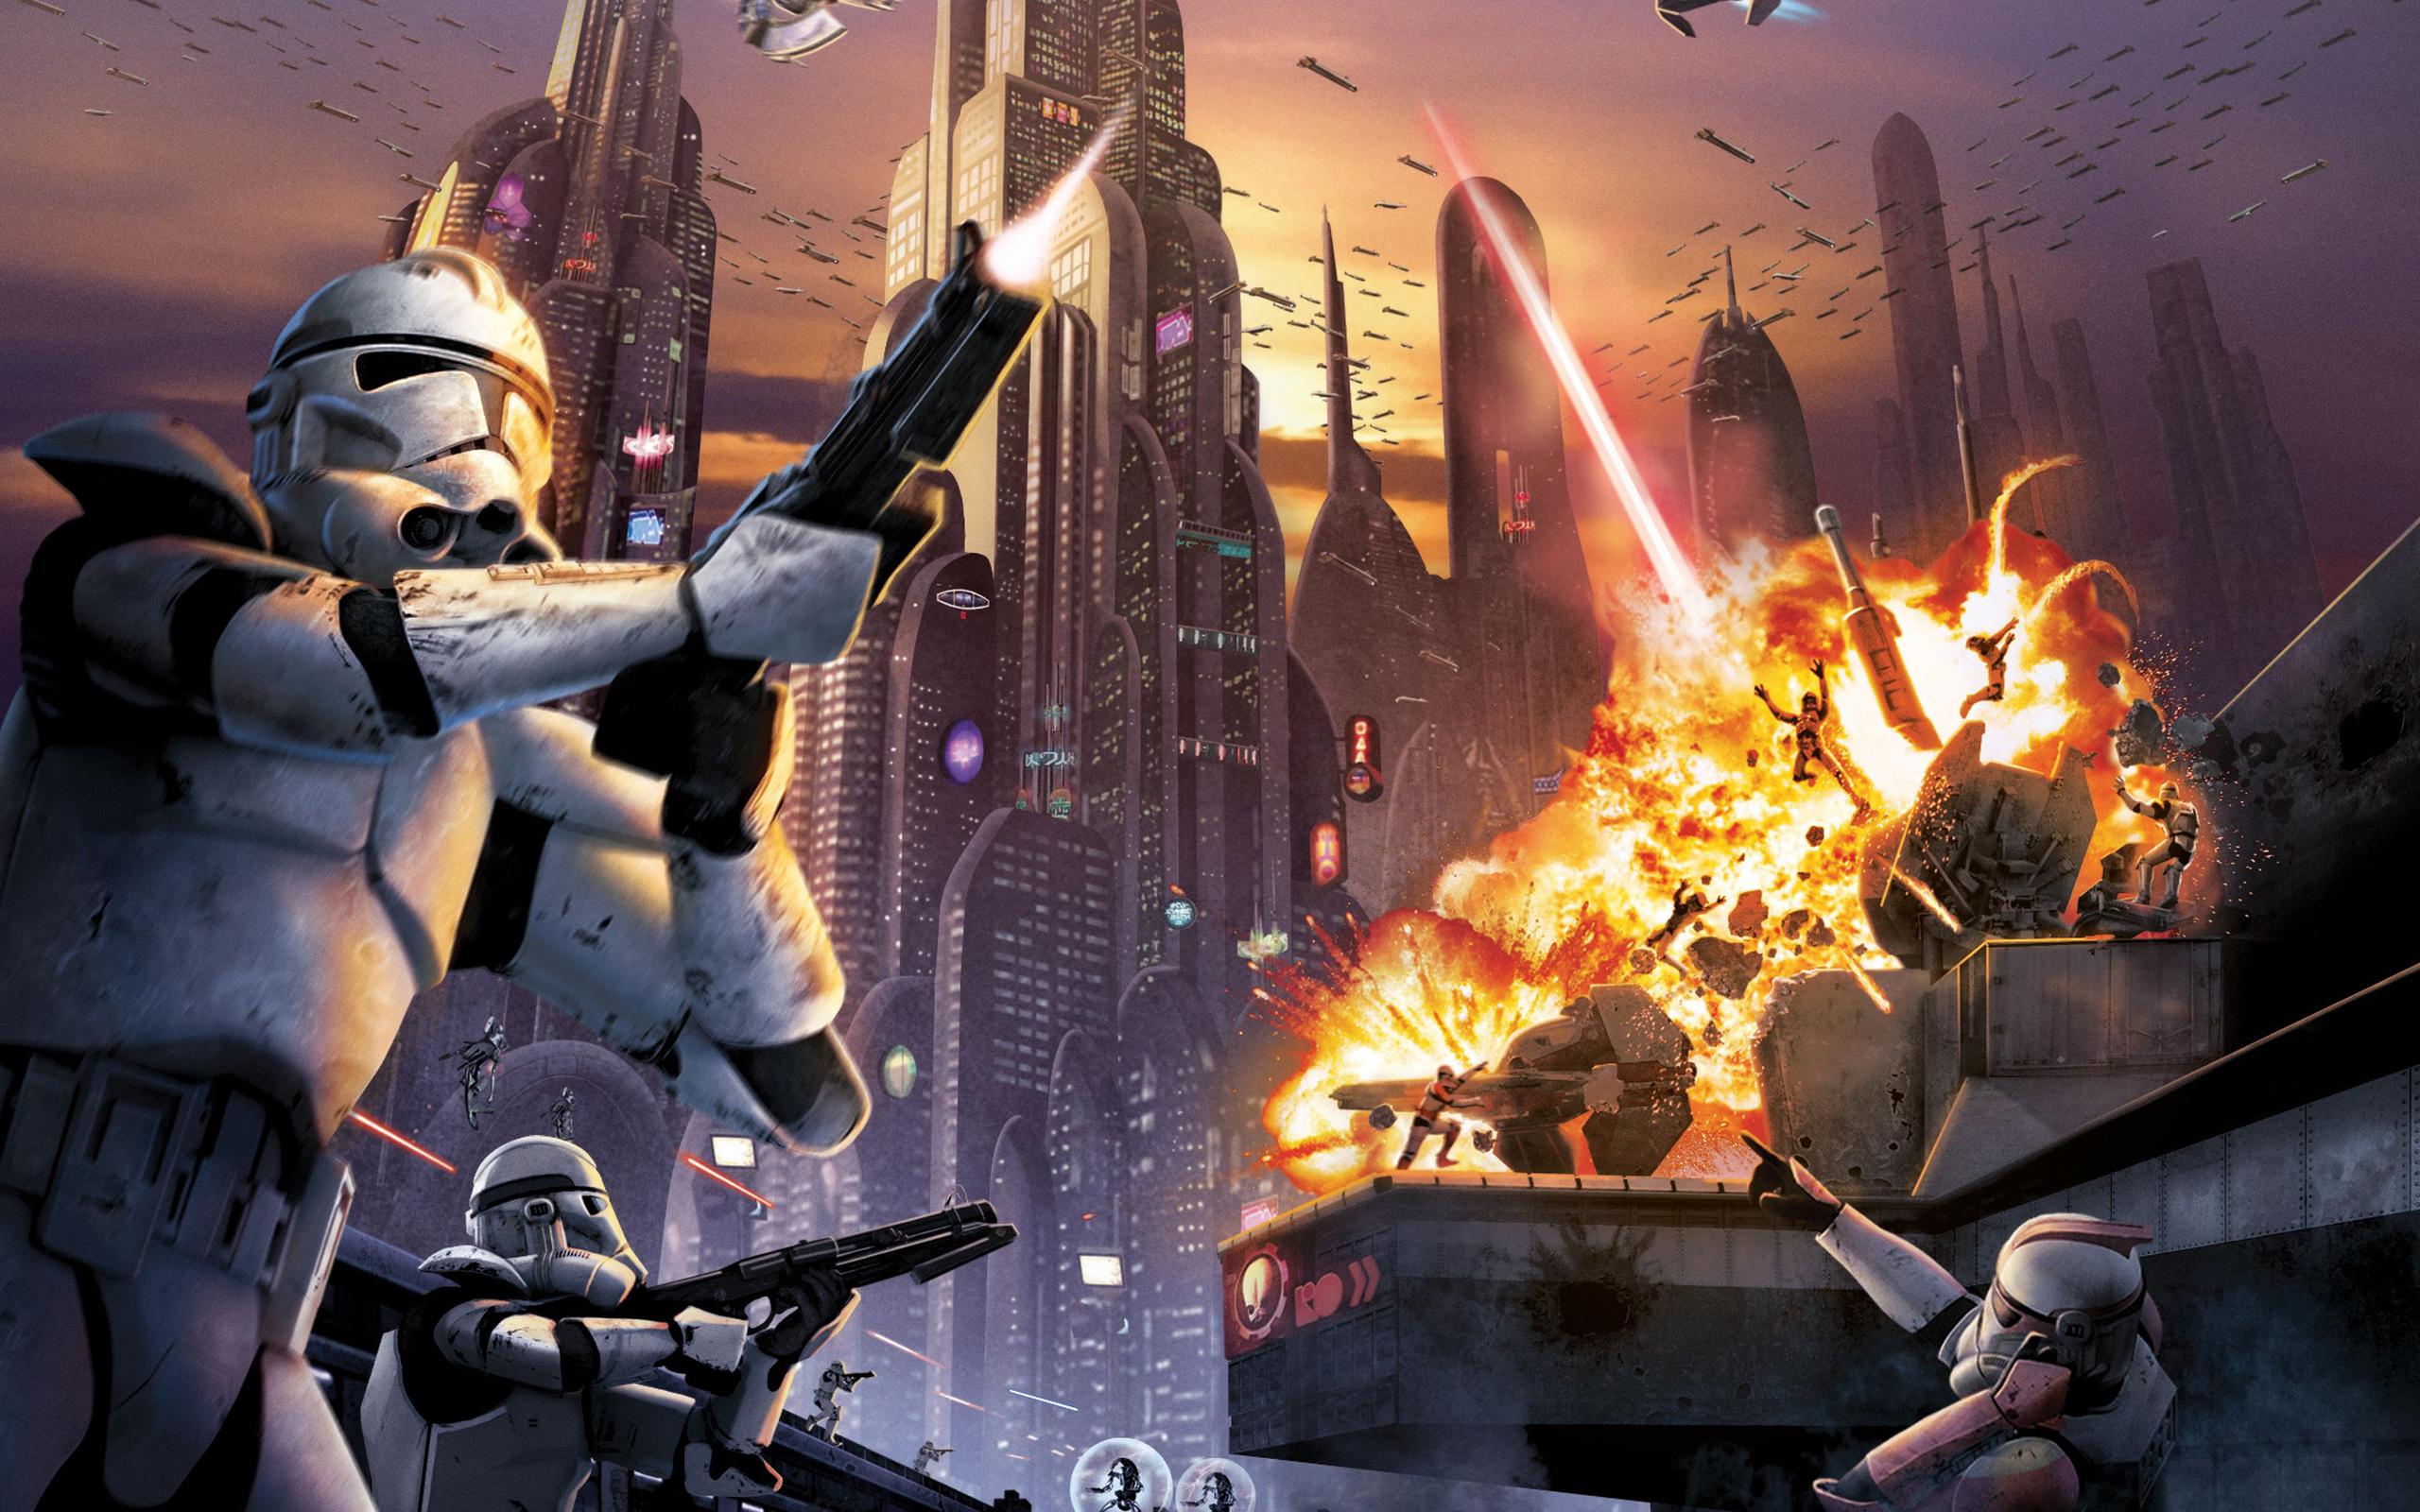 2560x1600 Star Wars Battlefront 2 4k 2560x1600 Resolution Hd 4k